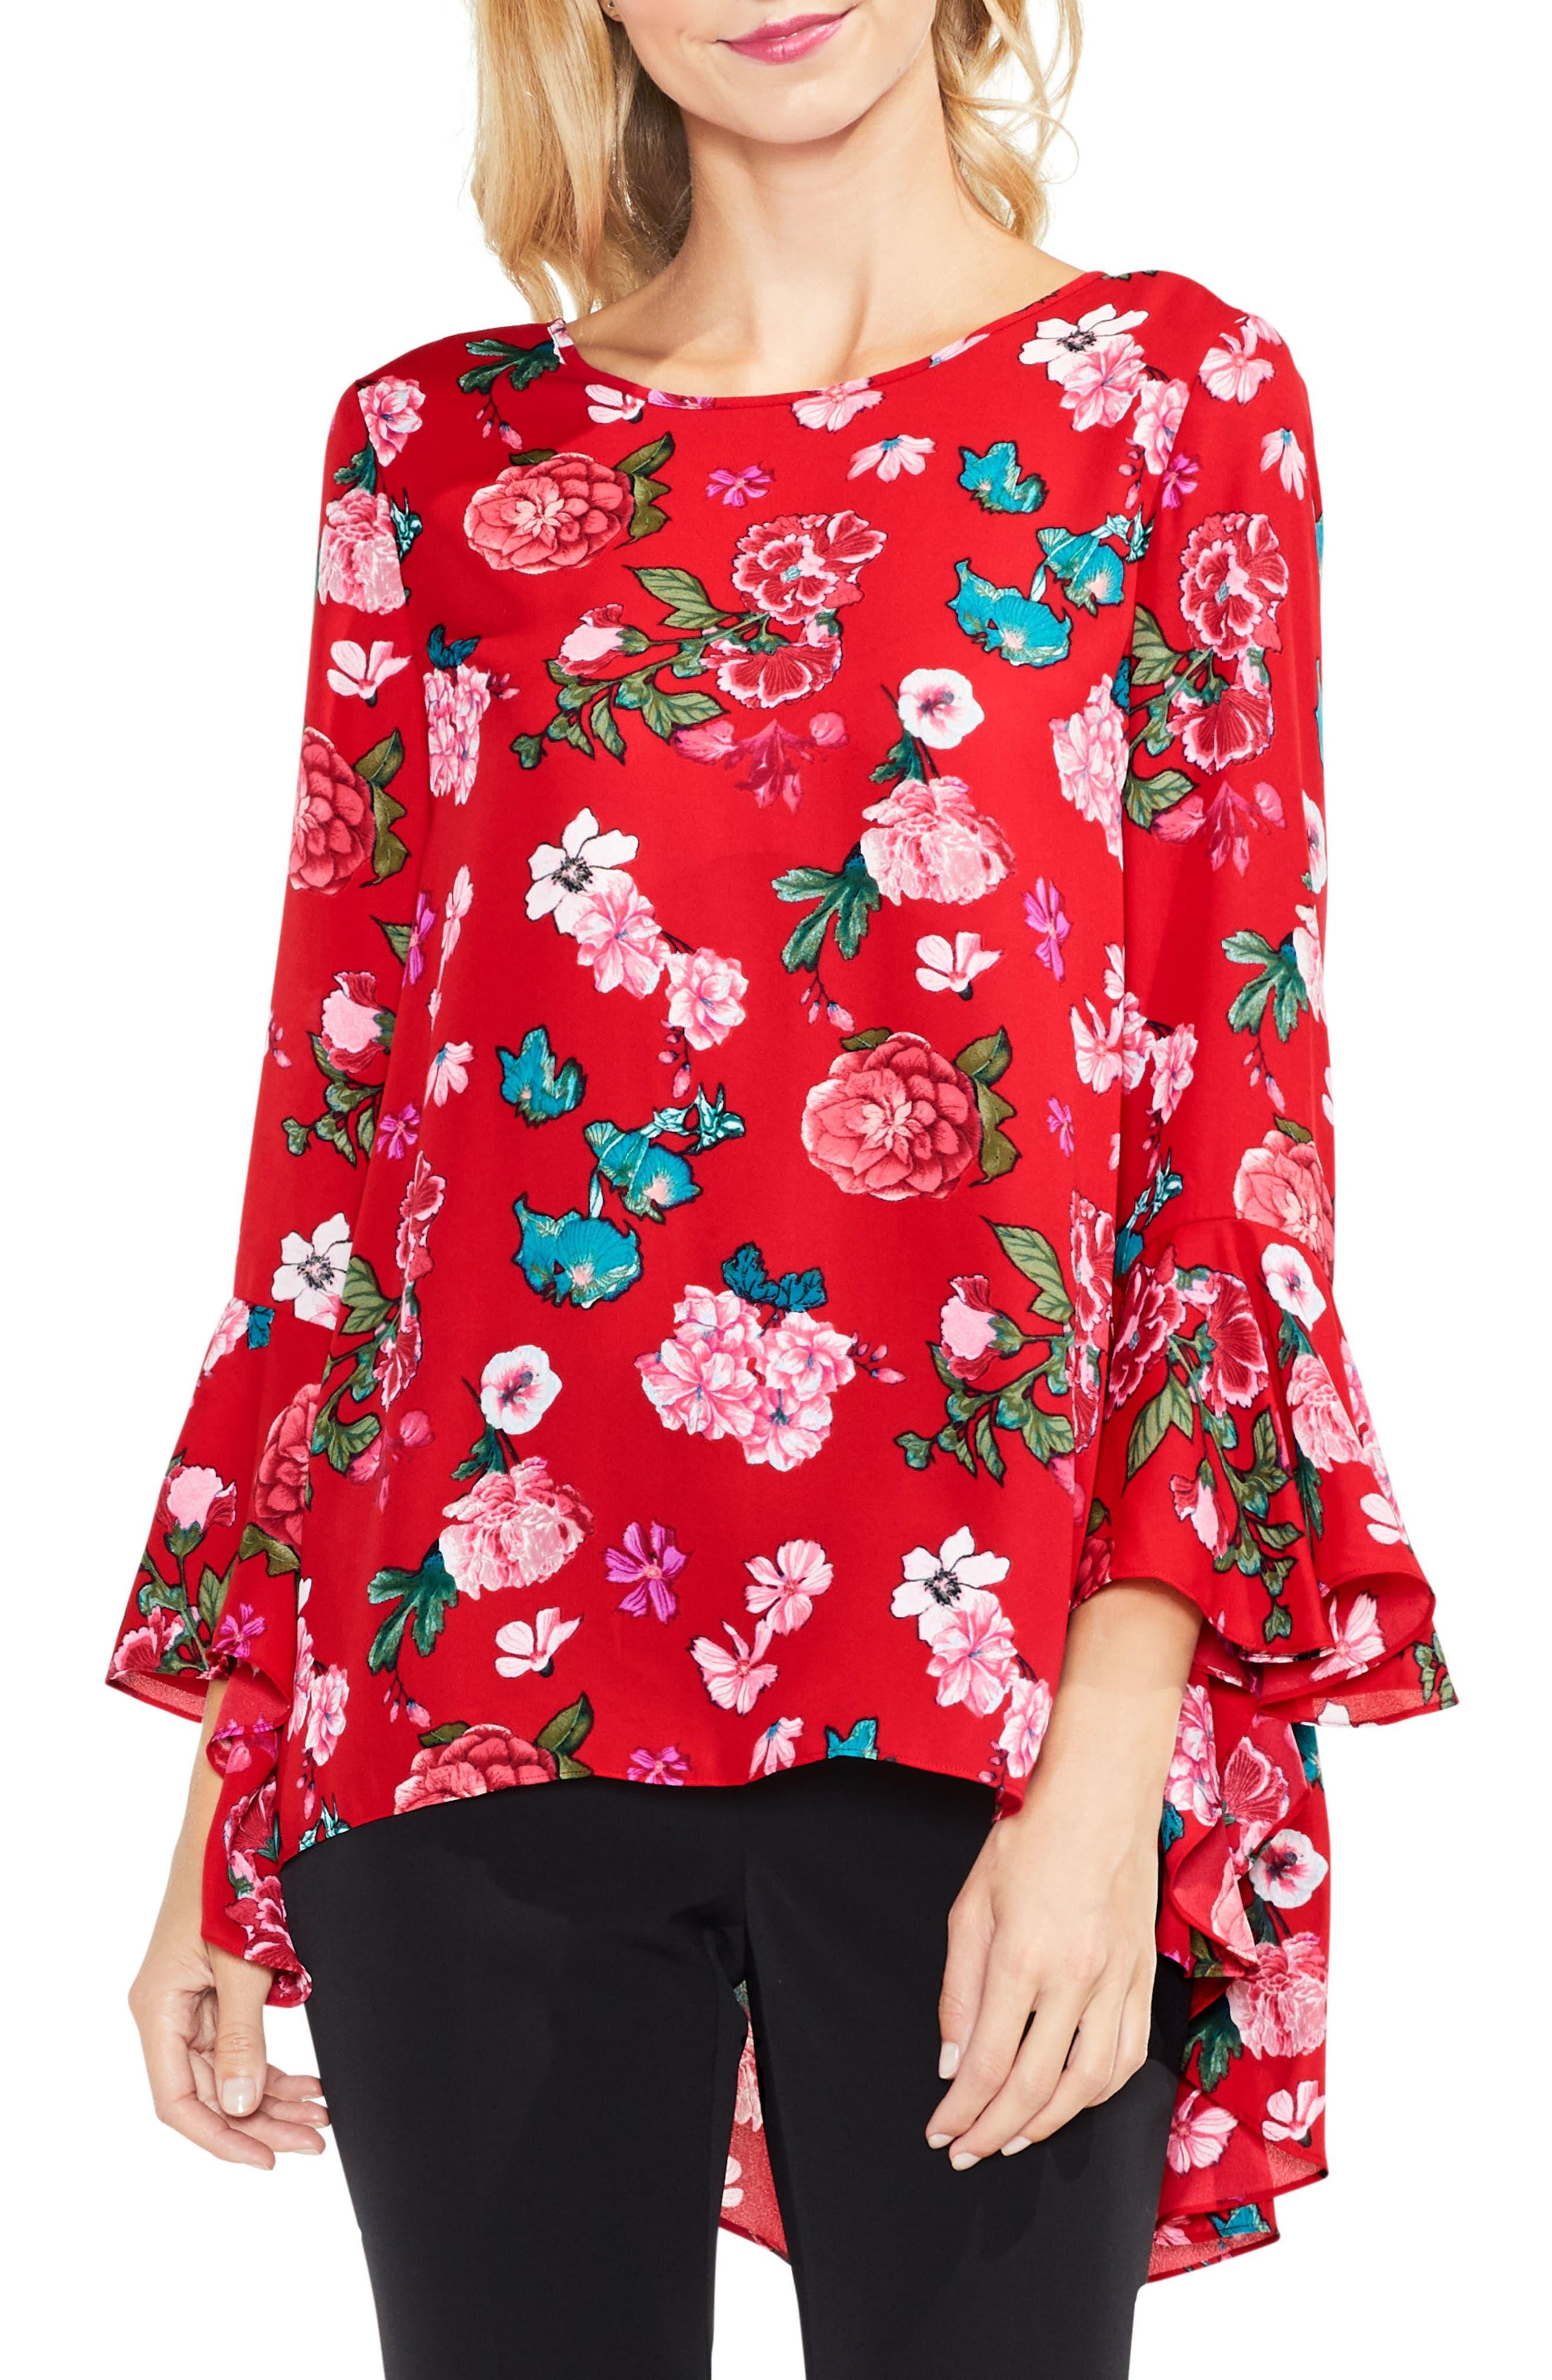 Alternate Image 1 Selected - Vince Camuto Floral Heirloom Bell Sleeve Top